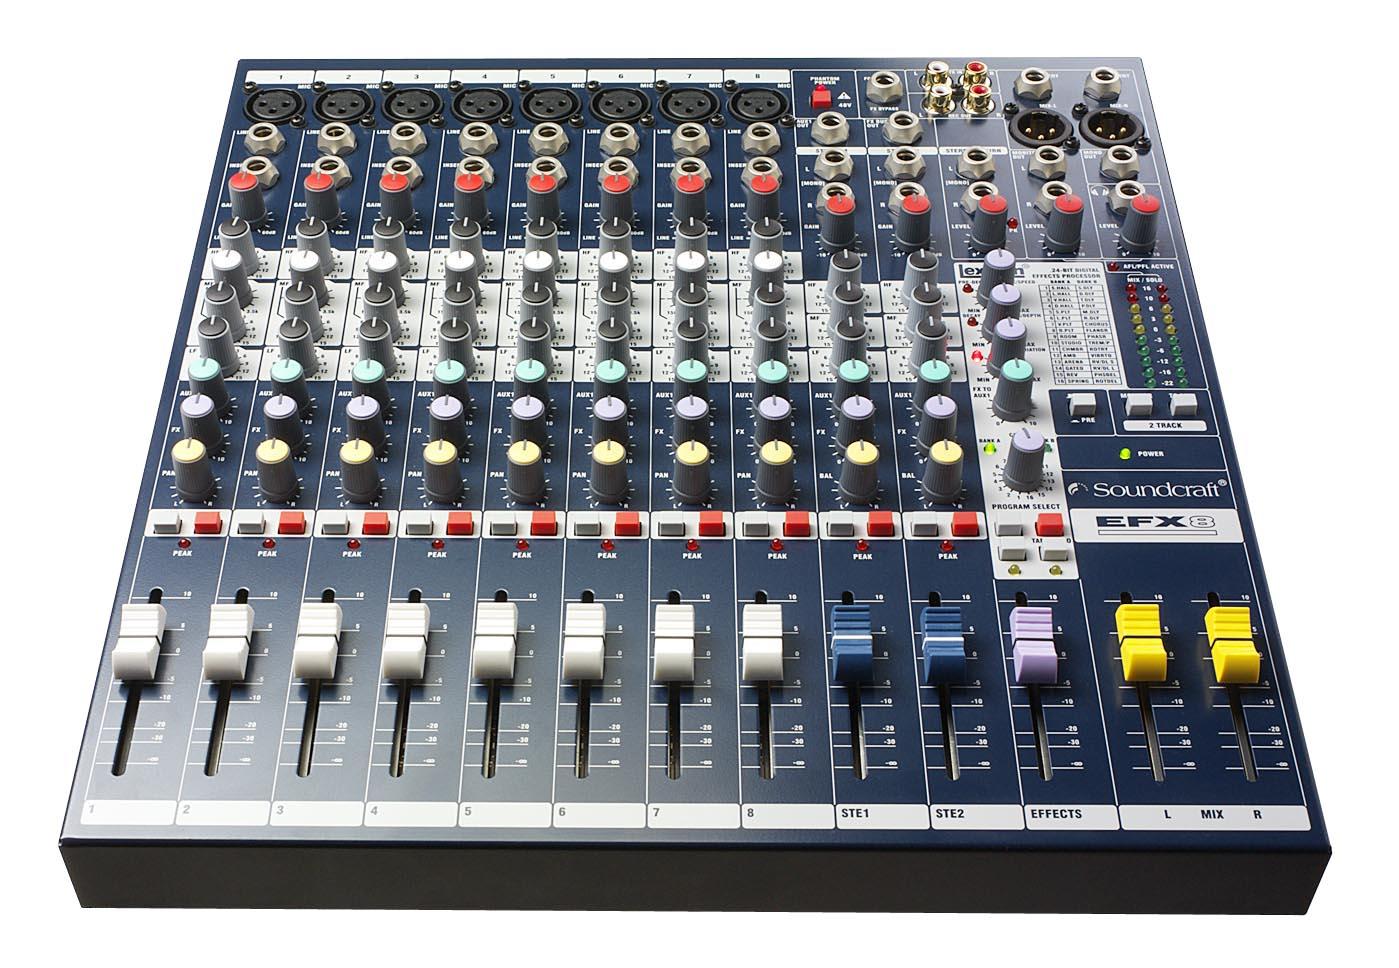 Mixer: Soundcraft EFX8 mixing desk